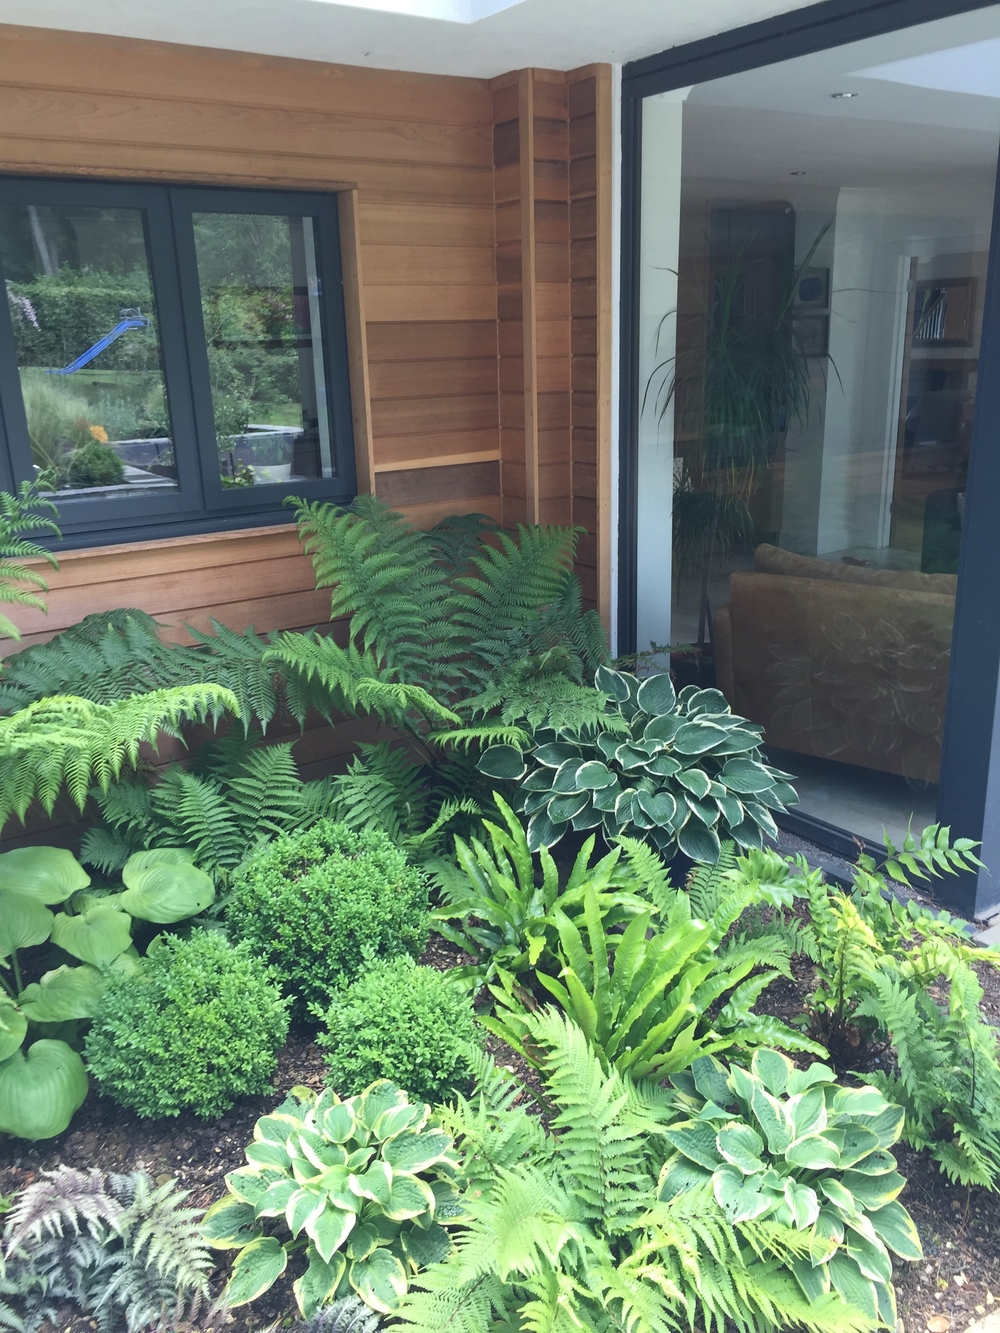 Shady corner - lush ferns and hostas with box balls